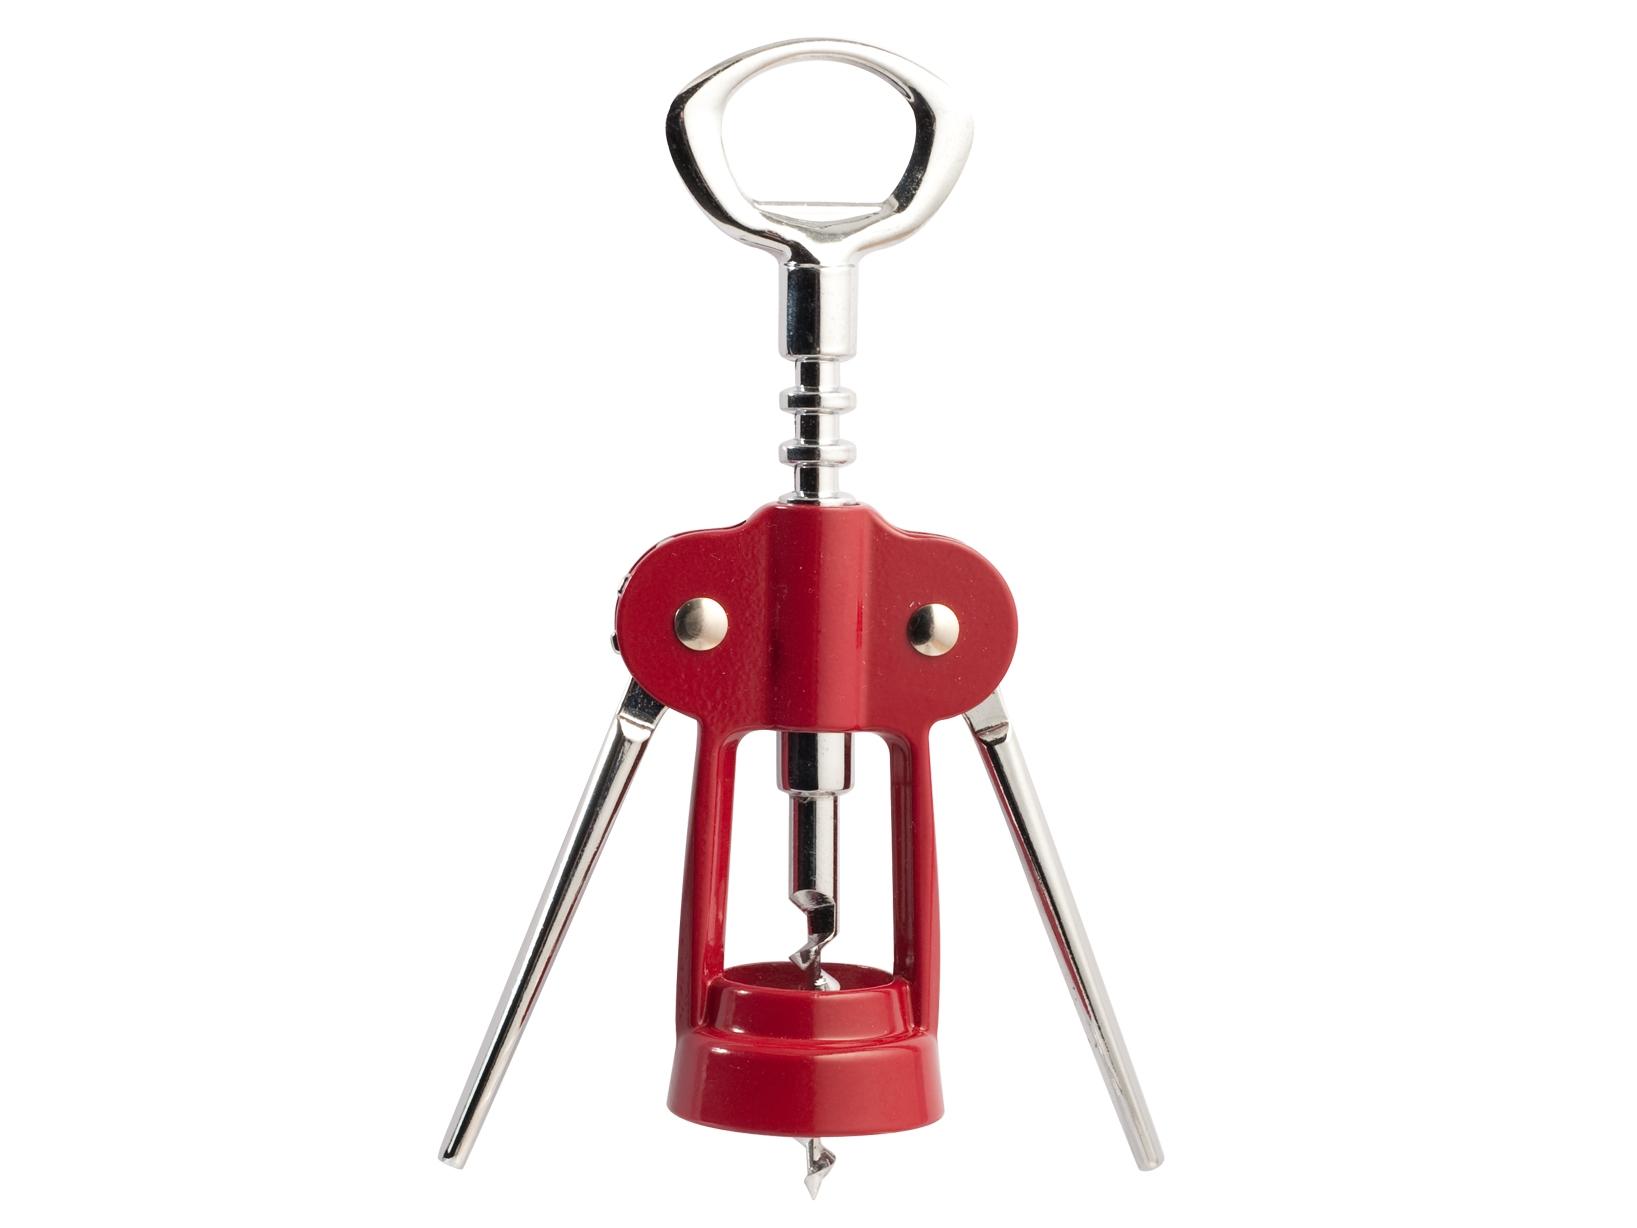 Acquista Levatappi 2 Leve Soave Rosso Arredo 17527577 | Glooke.com